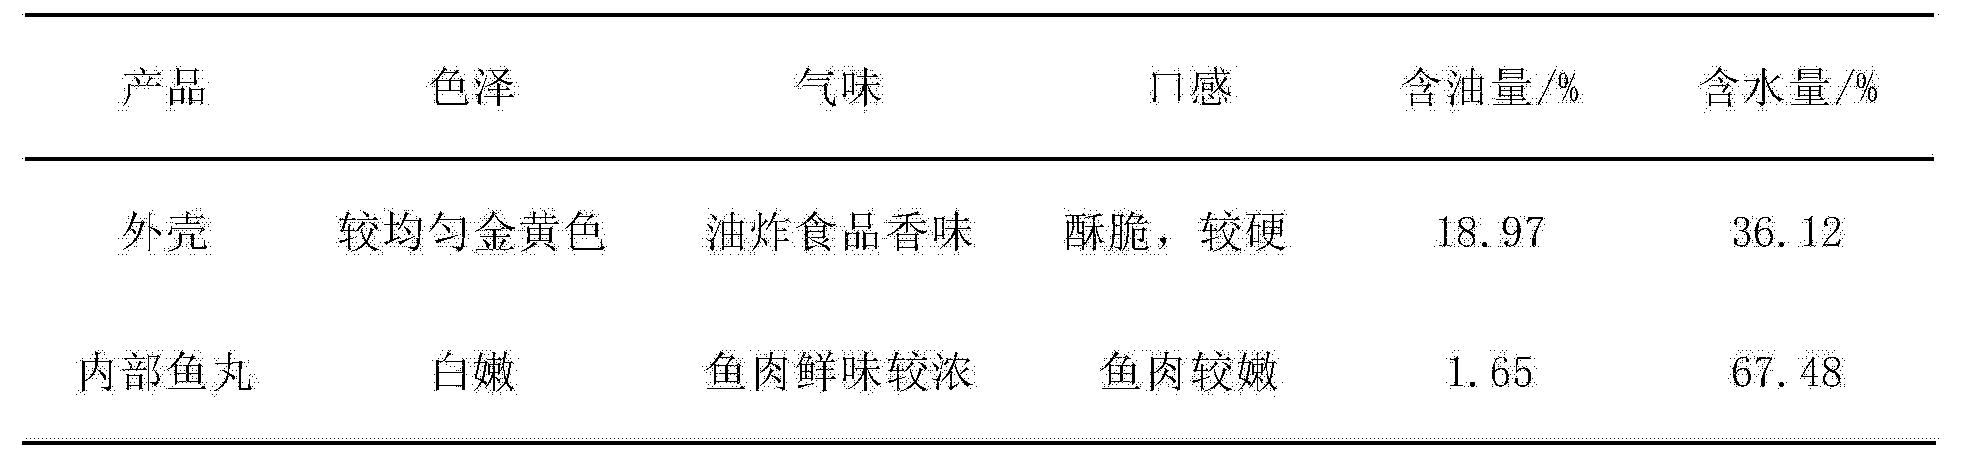 Figure CN104207152AD00061